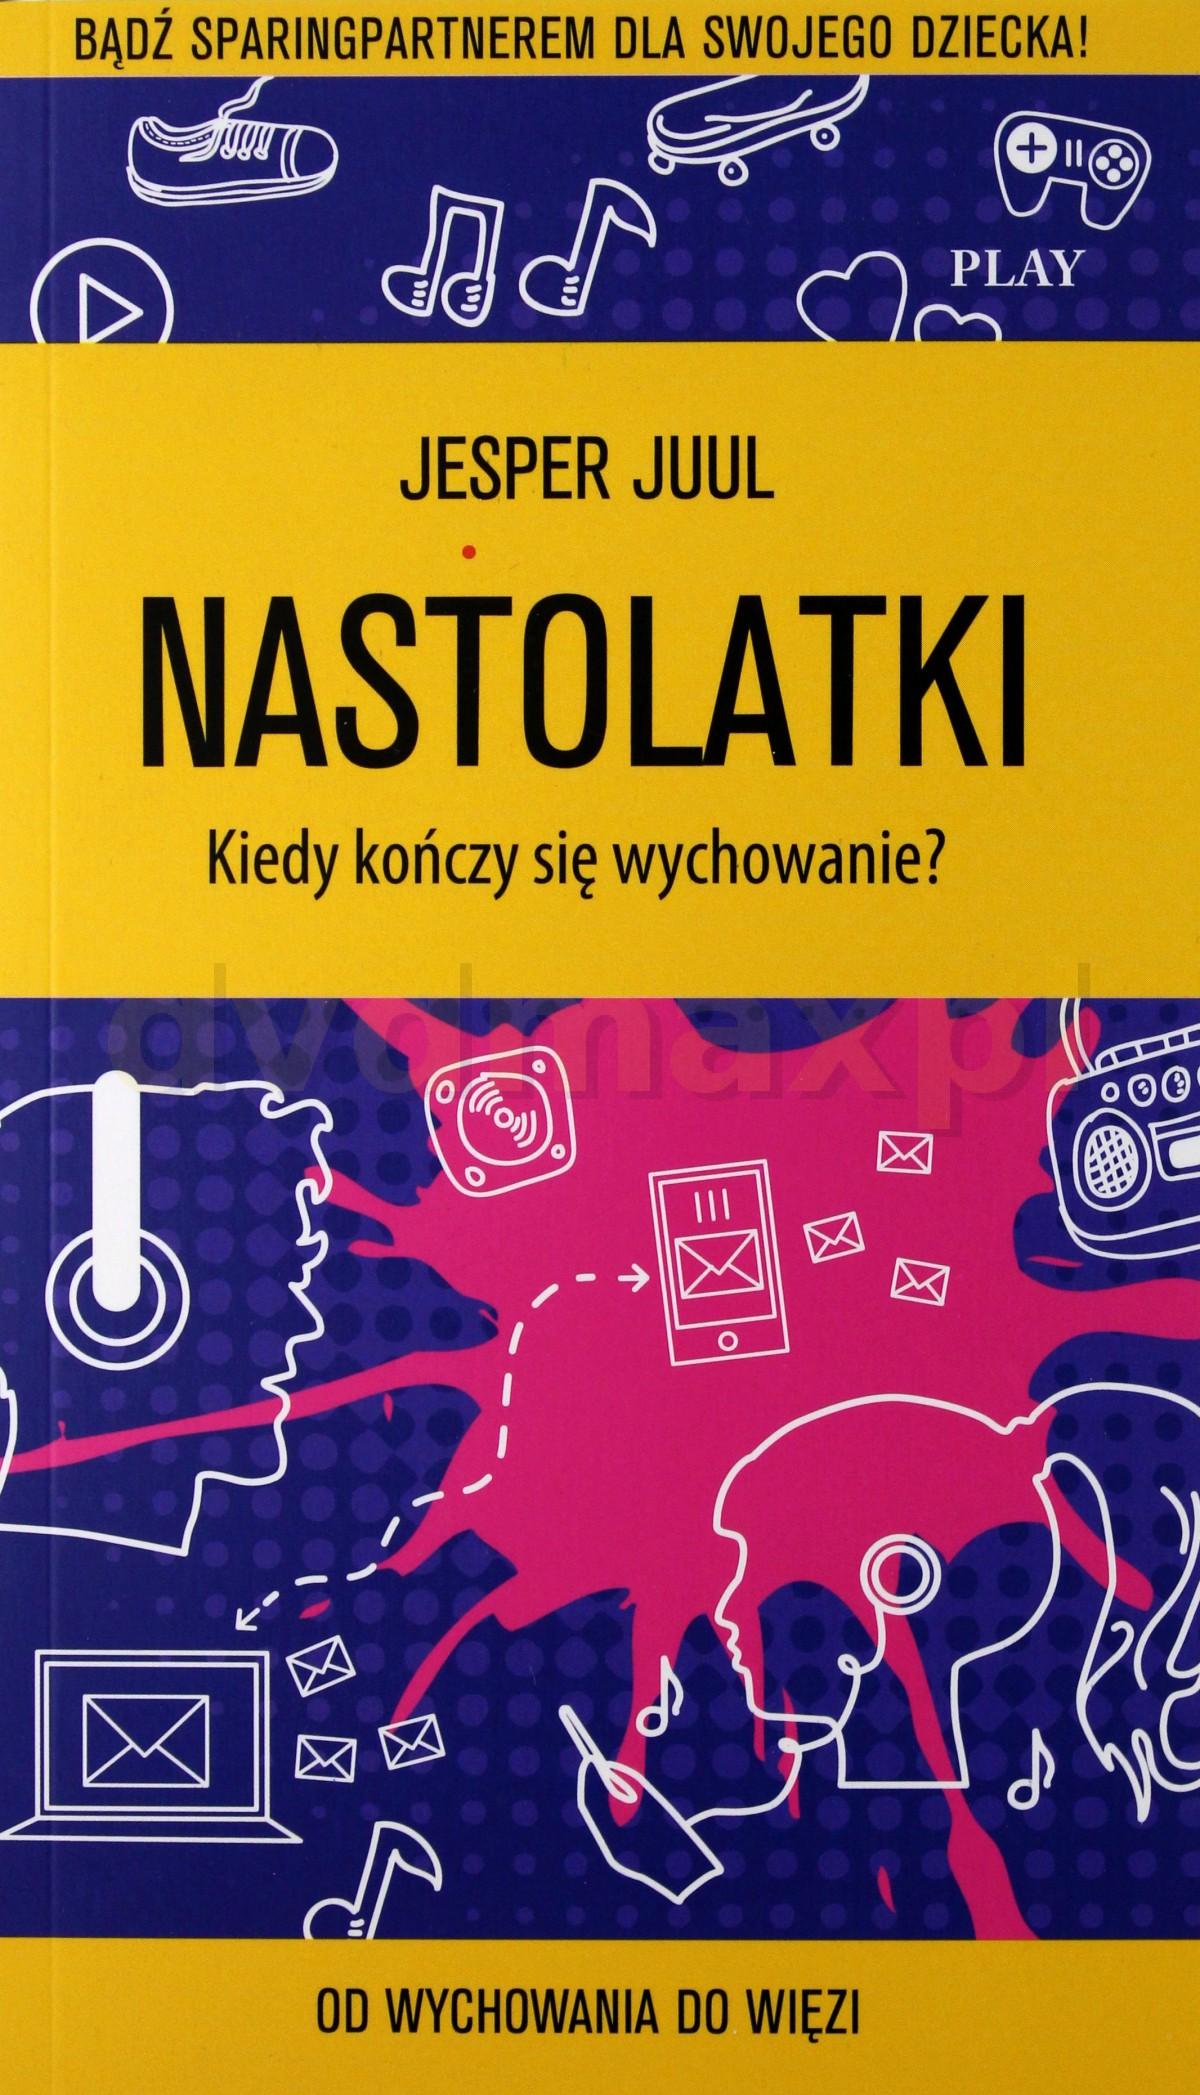 Nastolatki - Jesper Juul [KSIĄŻKA] - Jesper Juul